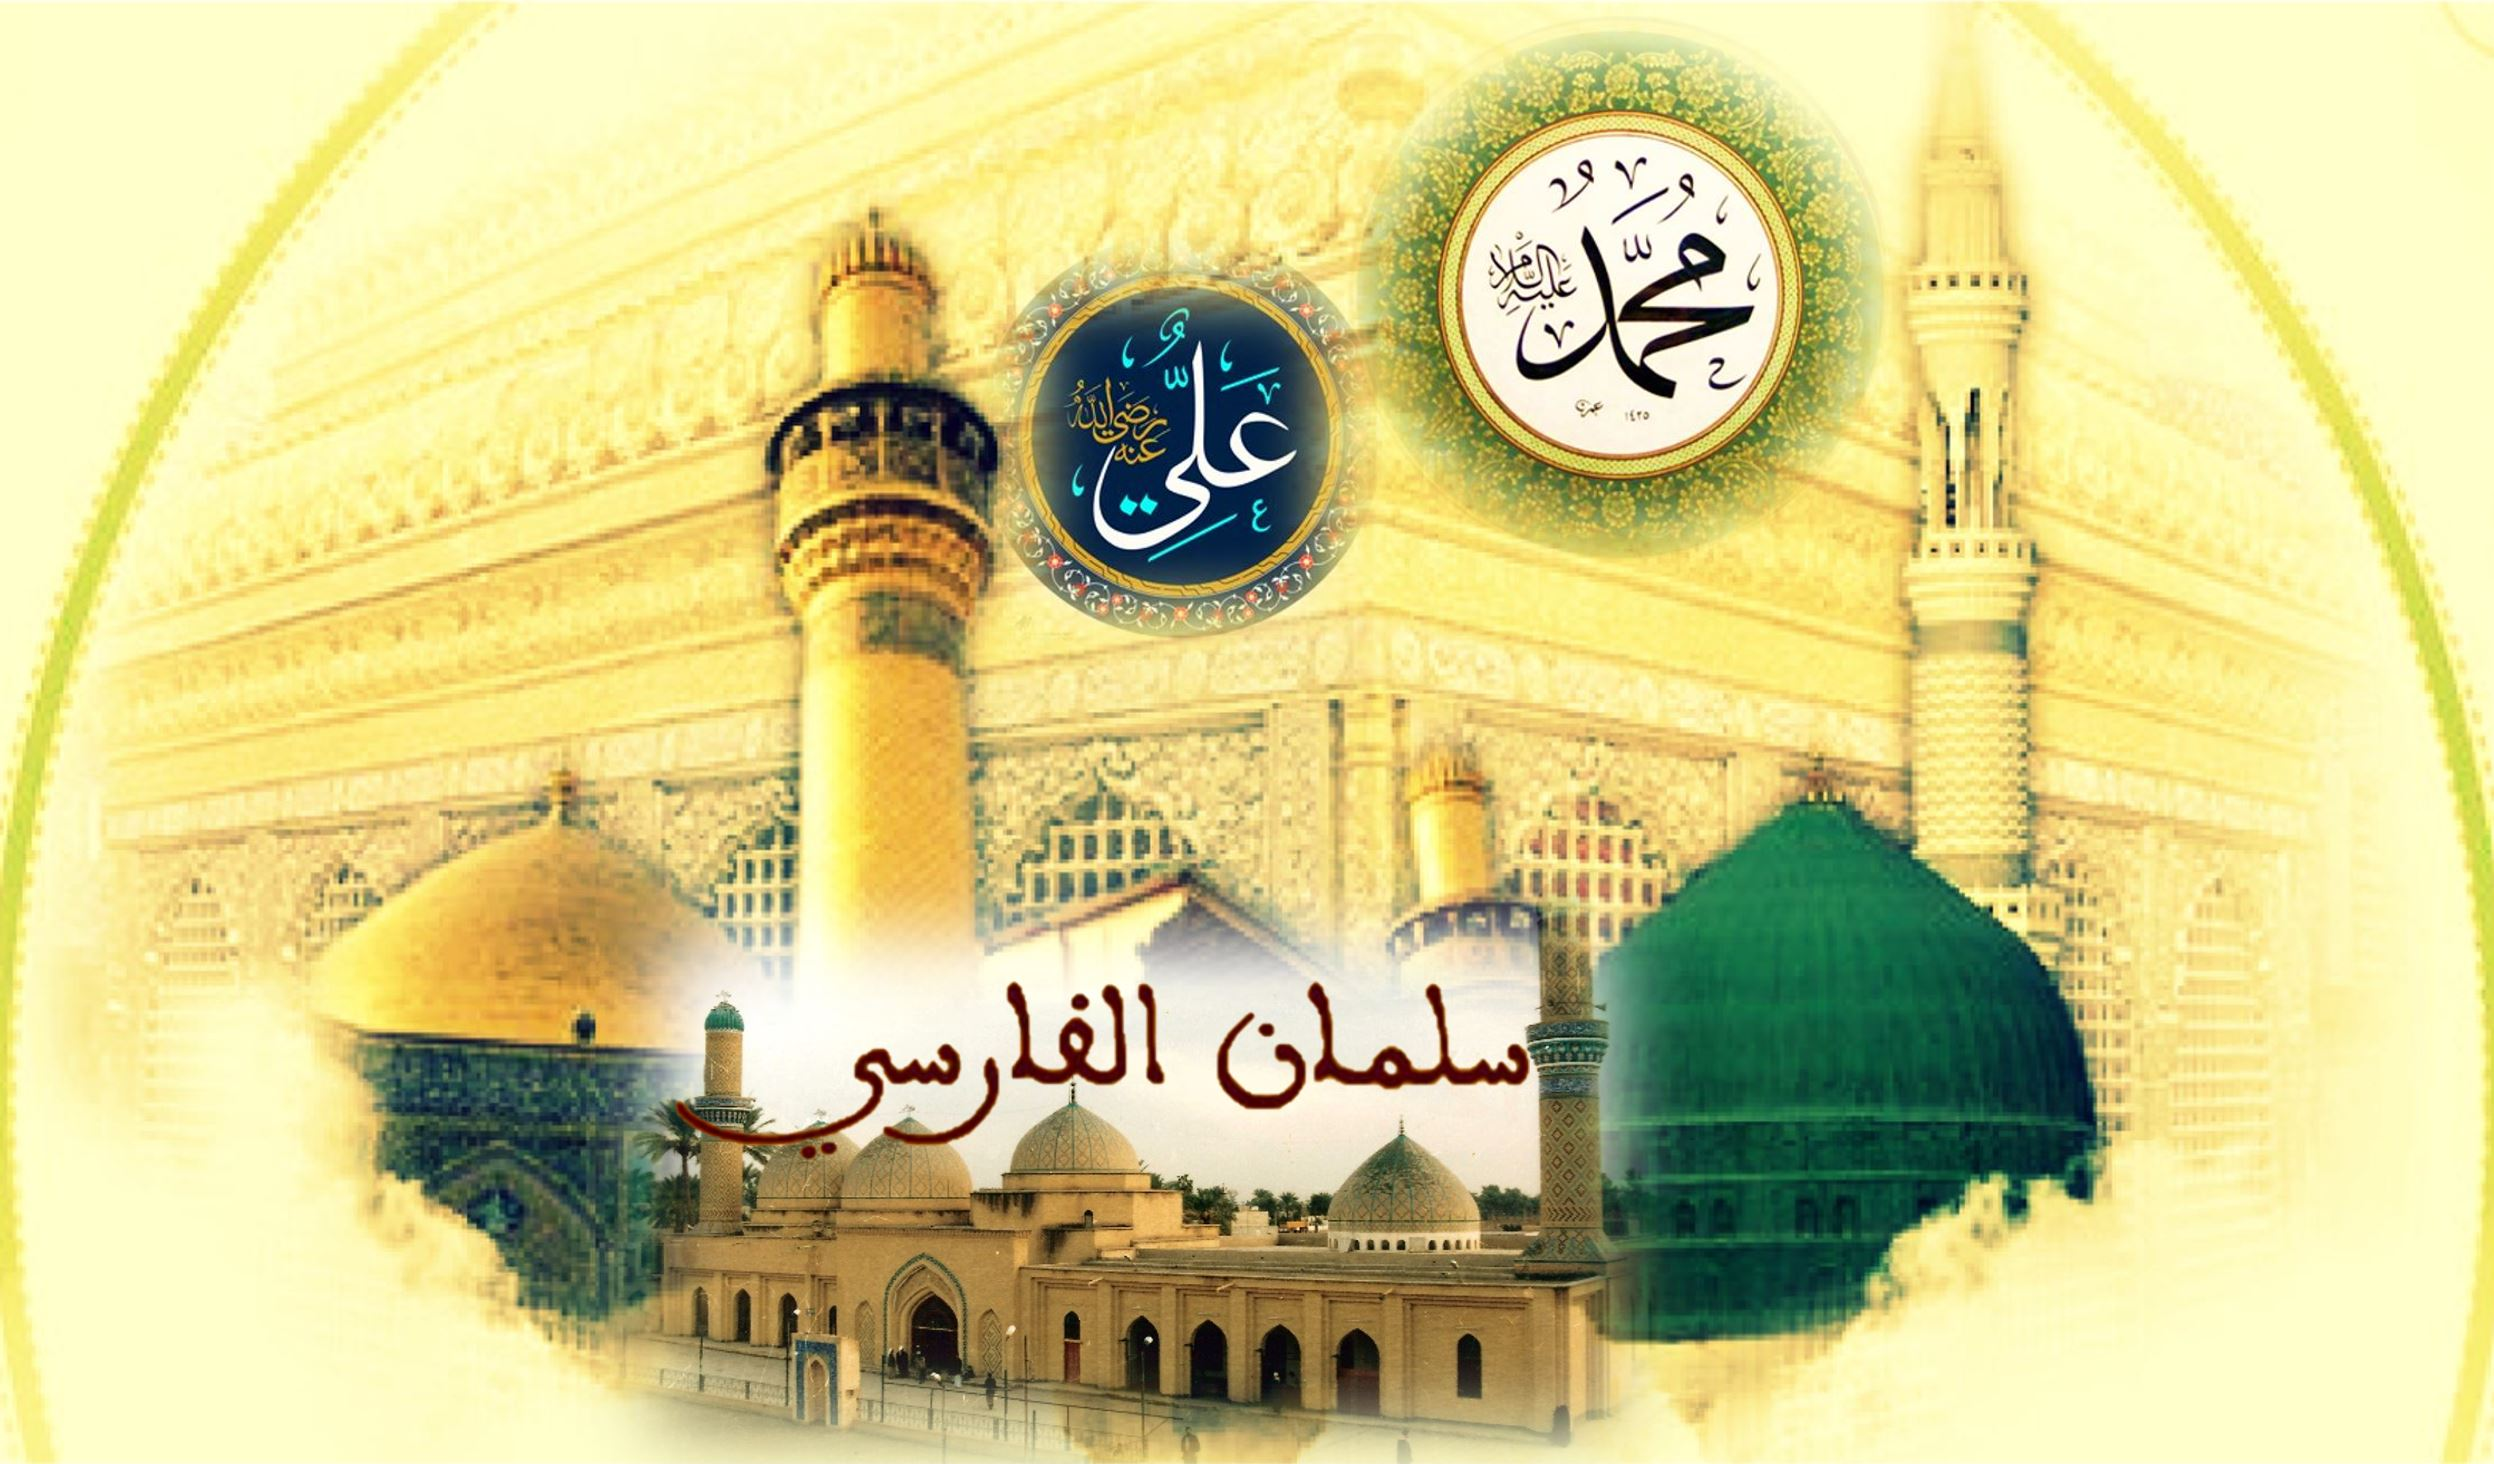 Madina Najaf Madain Prophet Muhammad saw Imam Ali (as) Salman al Farsi (as)